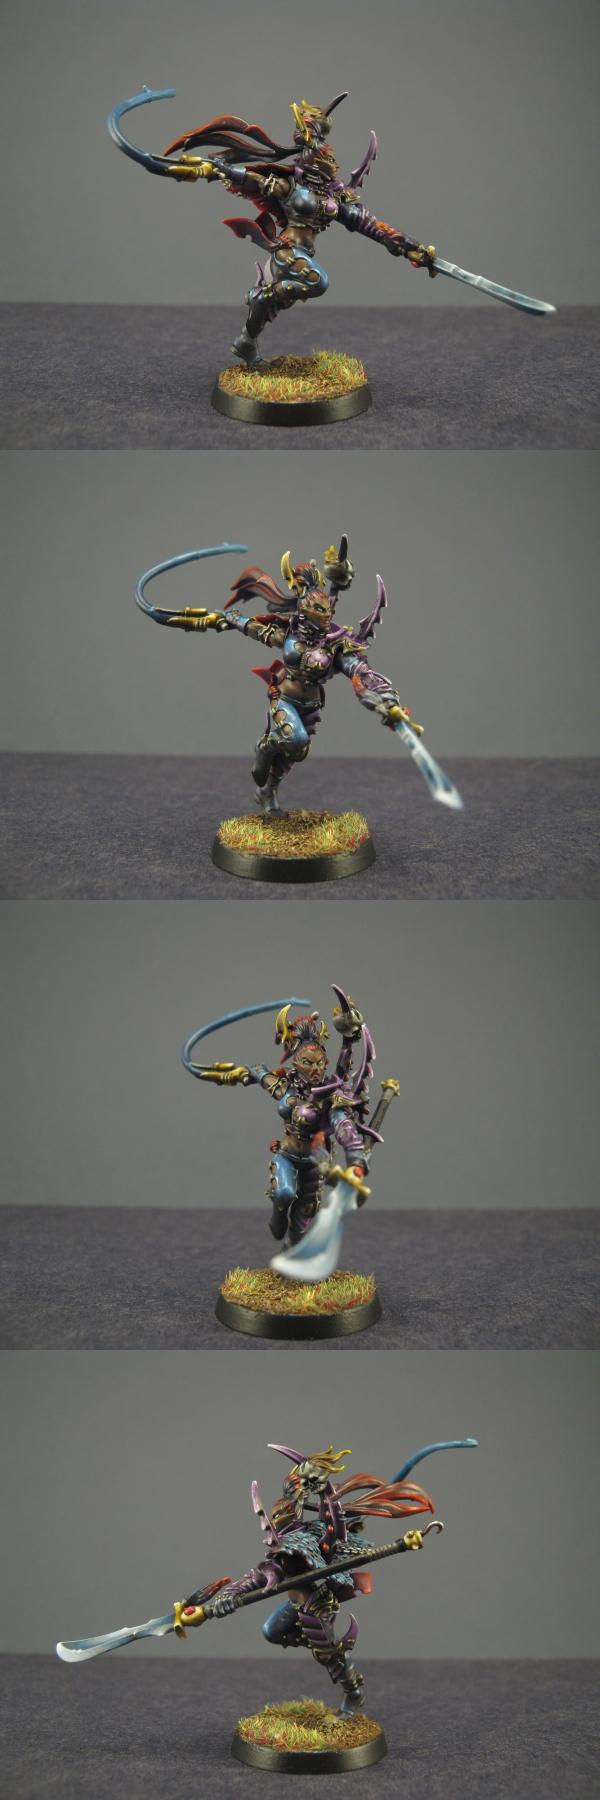 Dark Eldar, Succubus, Warhammer 40,000